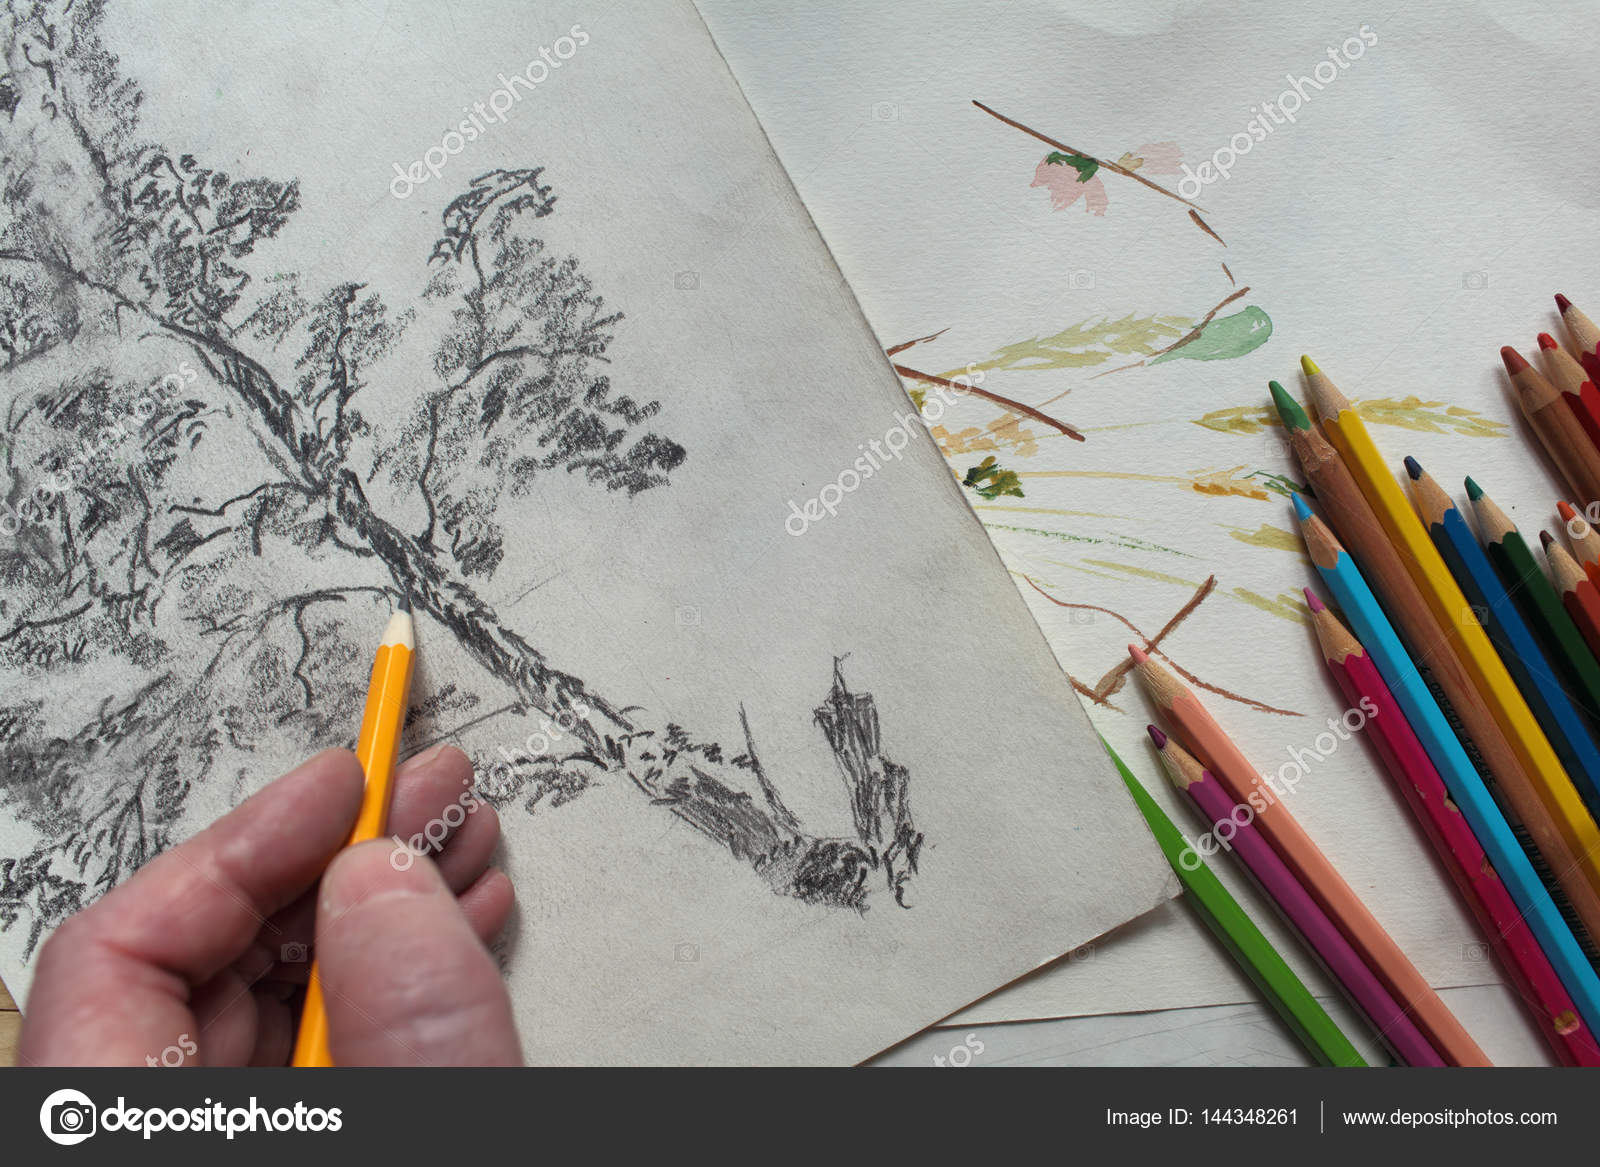 https depositphotos com 144348261 stock photo hand holding pencil drawing creative html